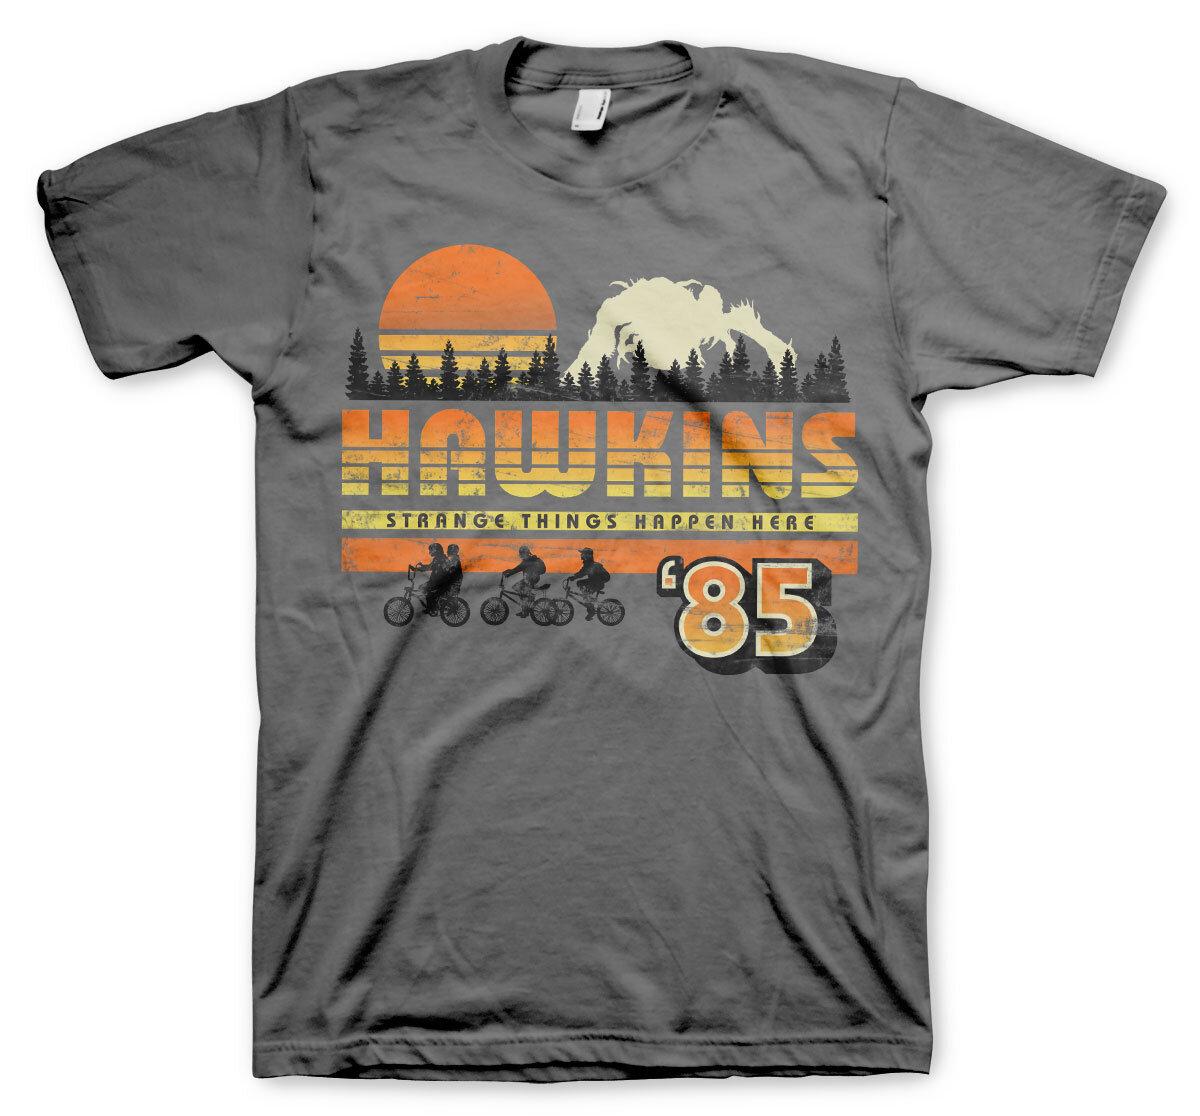 Hawkins '85 Vintage T-Shirt